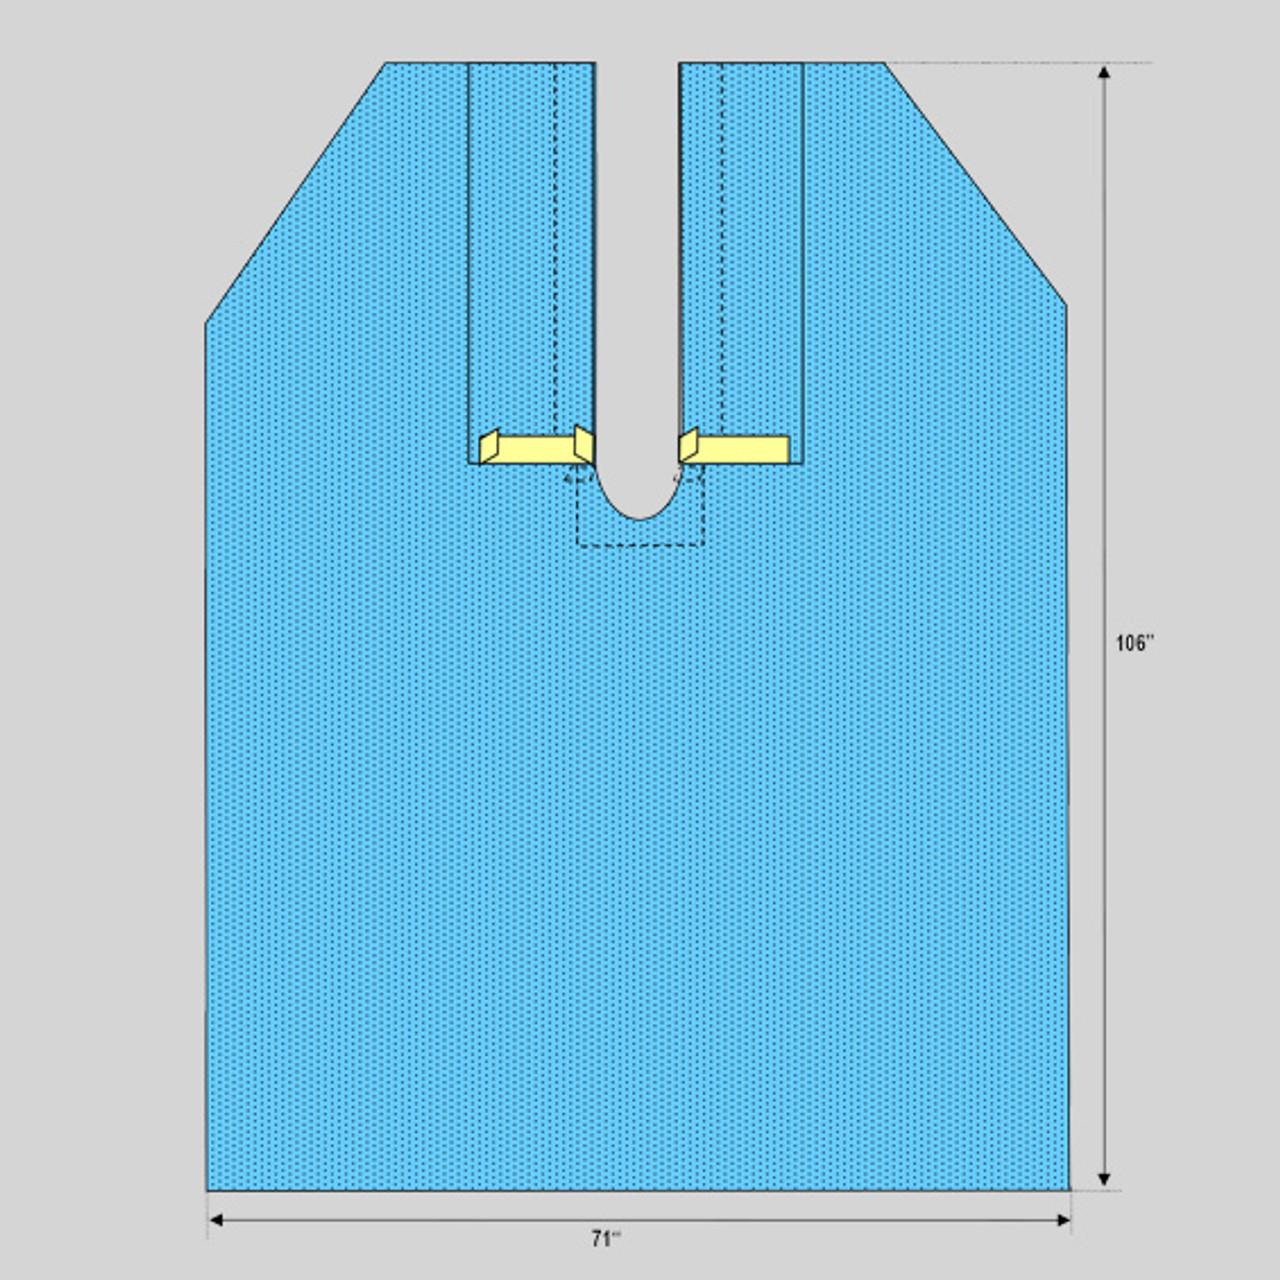 "Ophthalmic Split Drape, 71"" x 106"